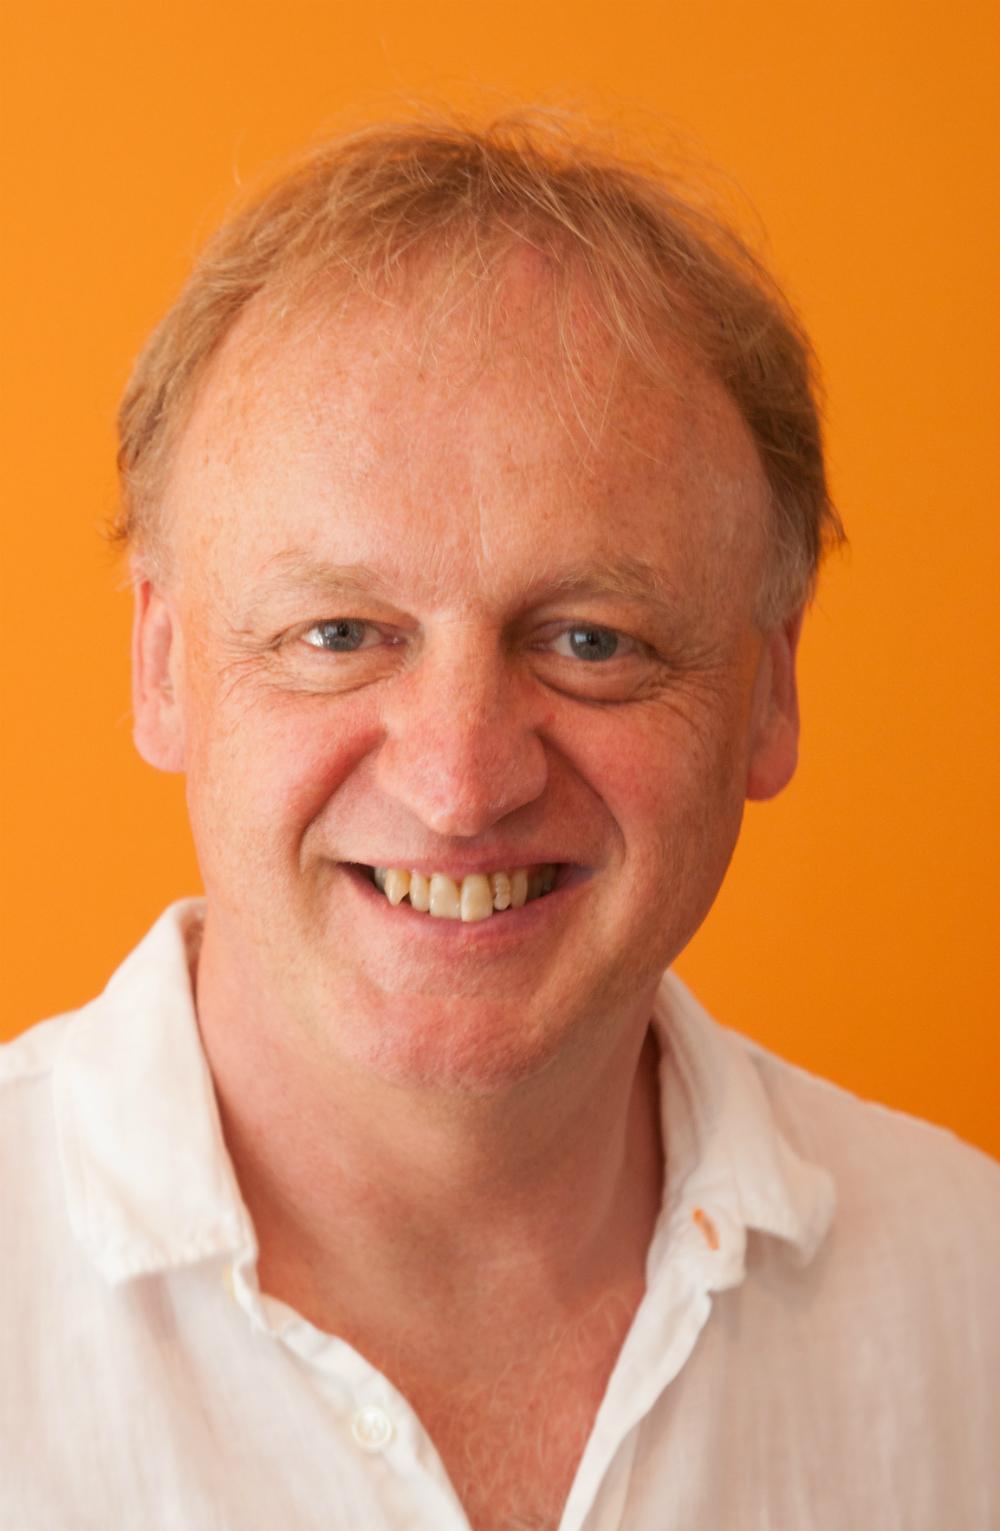 Jan van der Plas